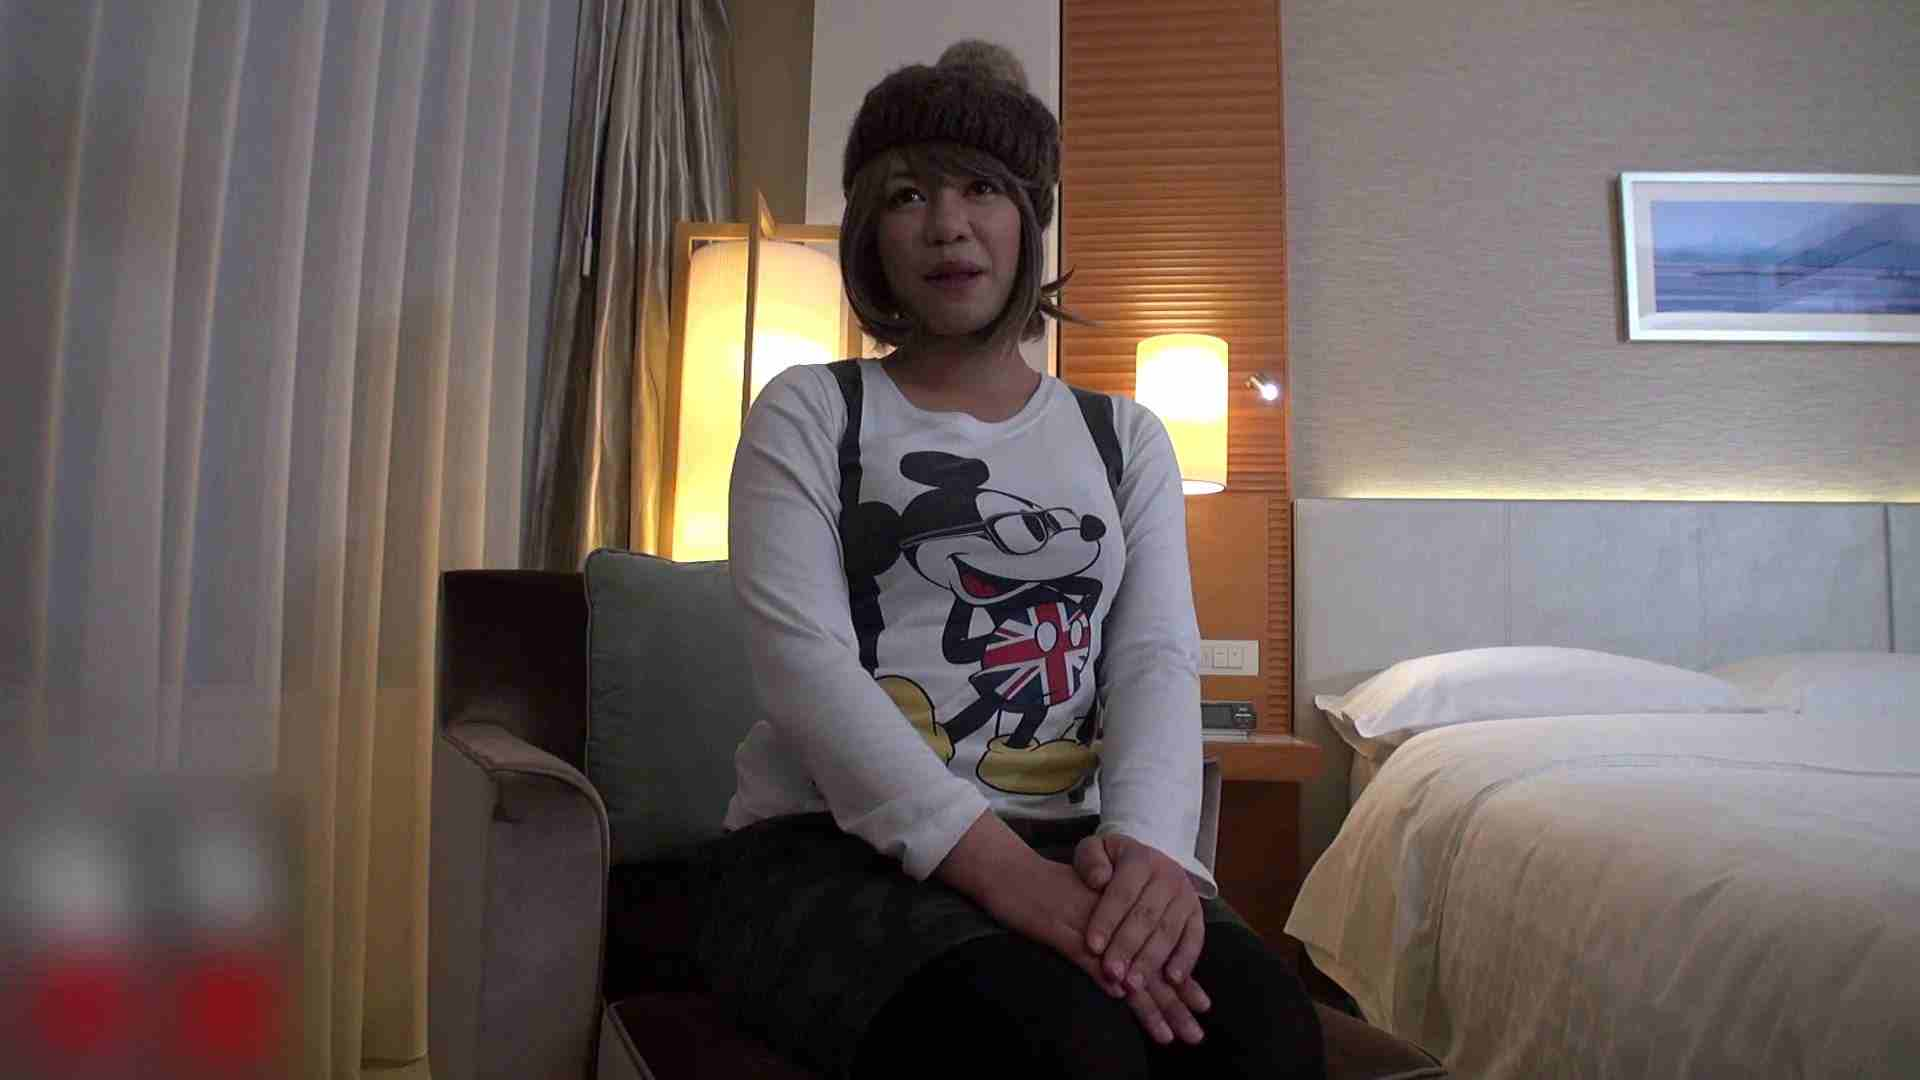 S級厳選美女ビッチガールVol.42 前編 S級美女ギャル 性交動画流出 83画像 48